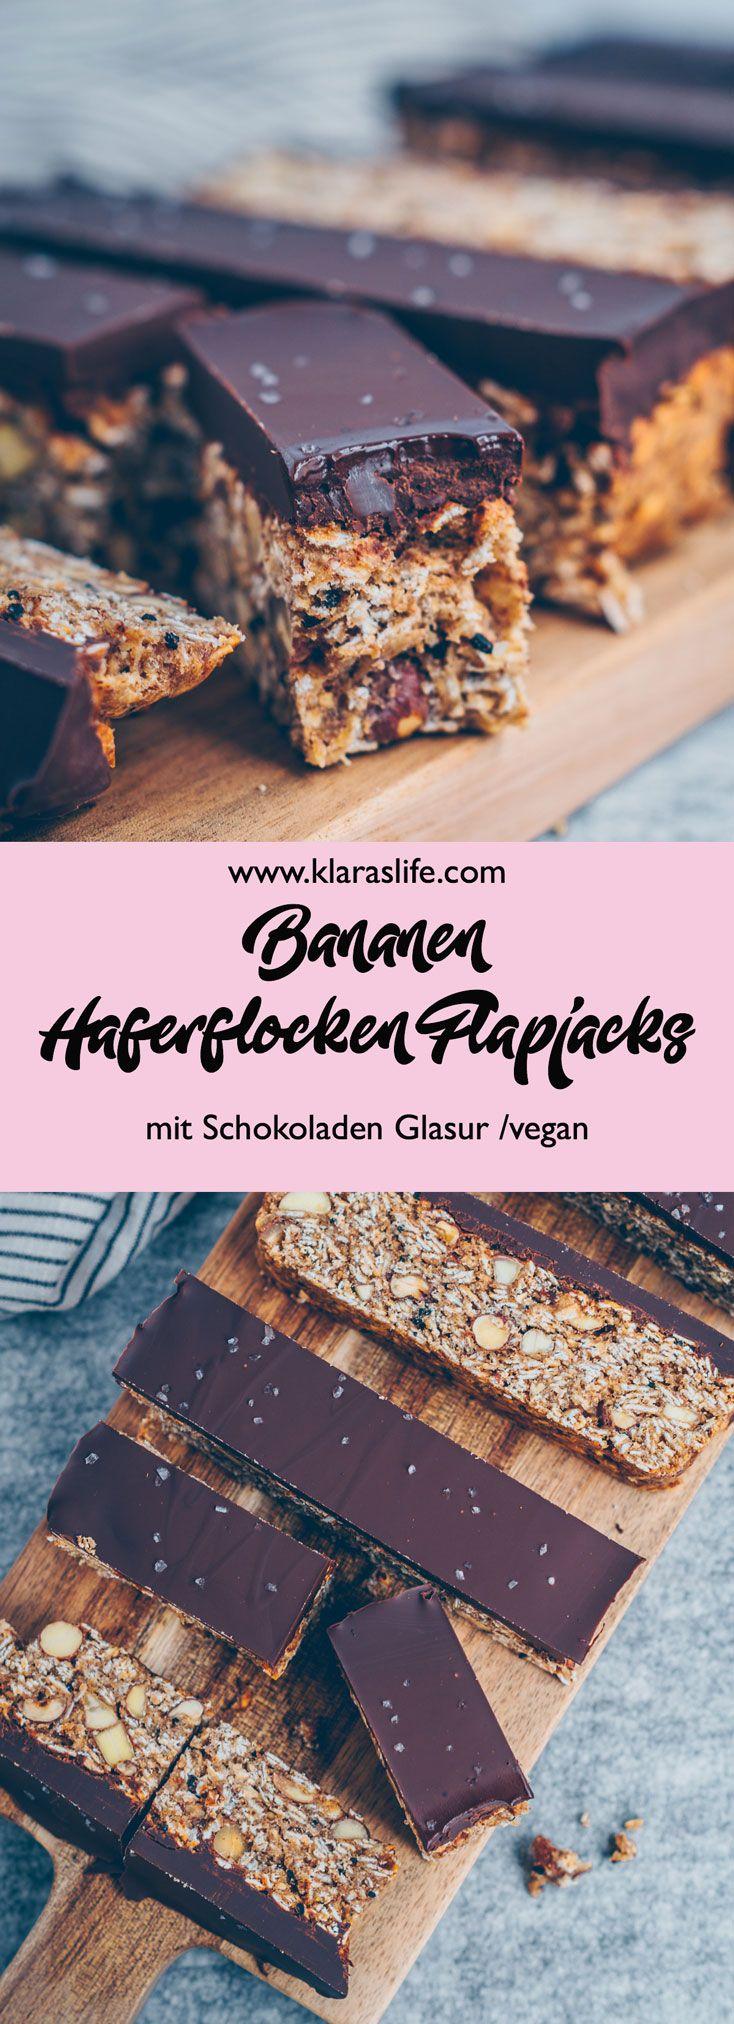 Bananen Haferflocken Flapjacks mit Schokoladenglasur - Klara`s Life #healthymarshmallows